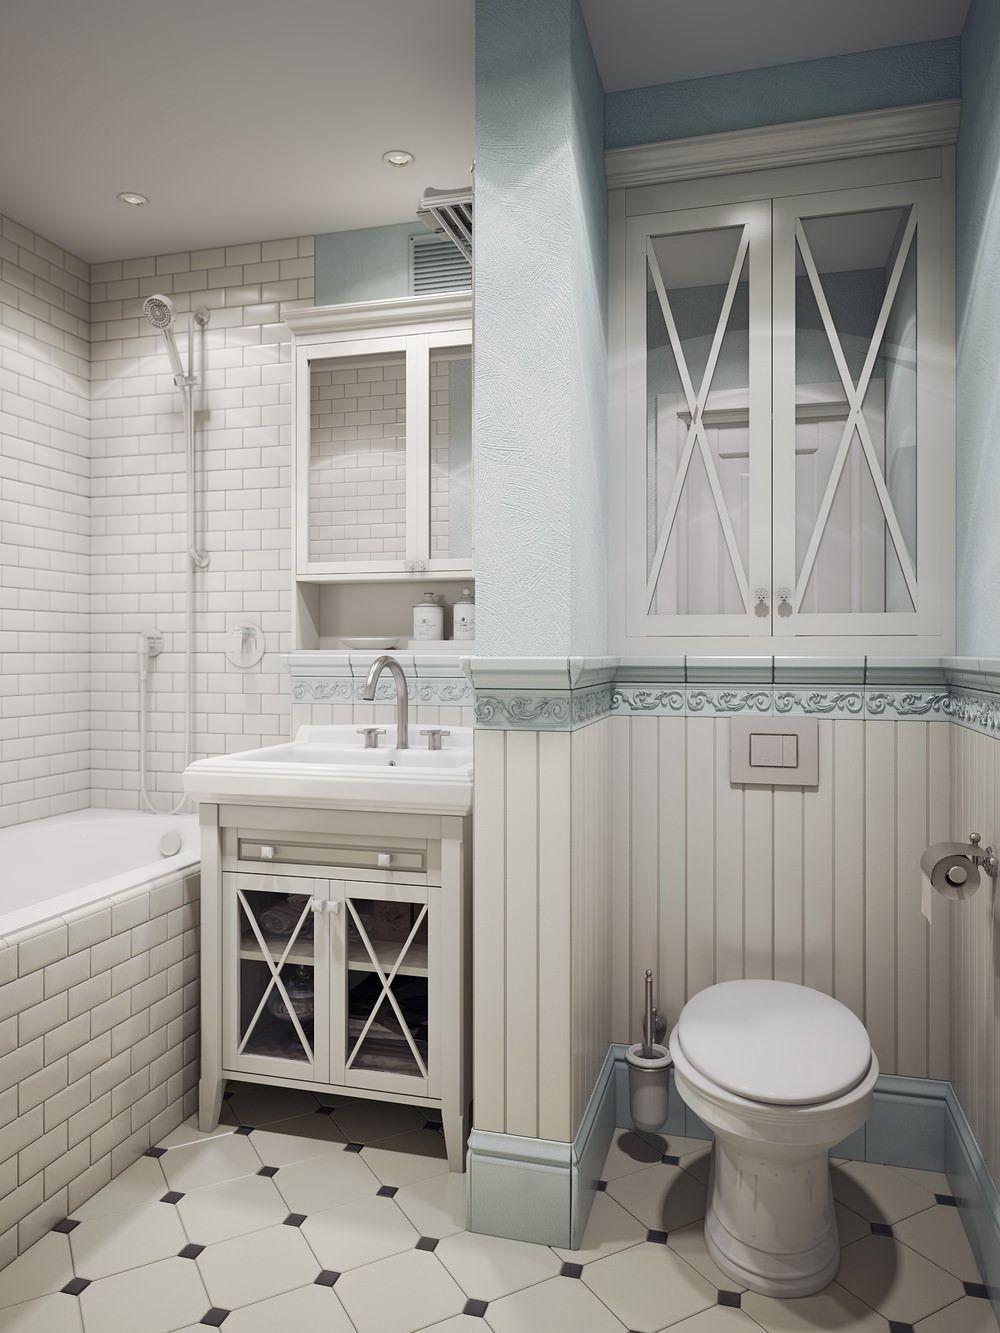 976137814cbaedbc7462f7610792de08 - Идеи для ремонта туалета своими руками